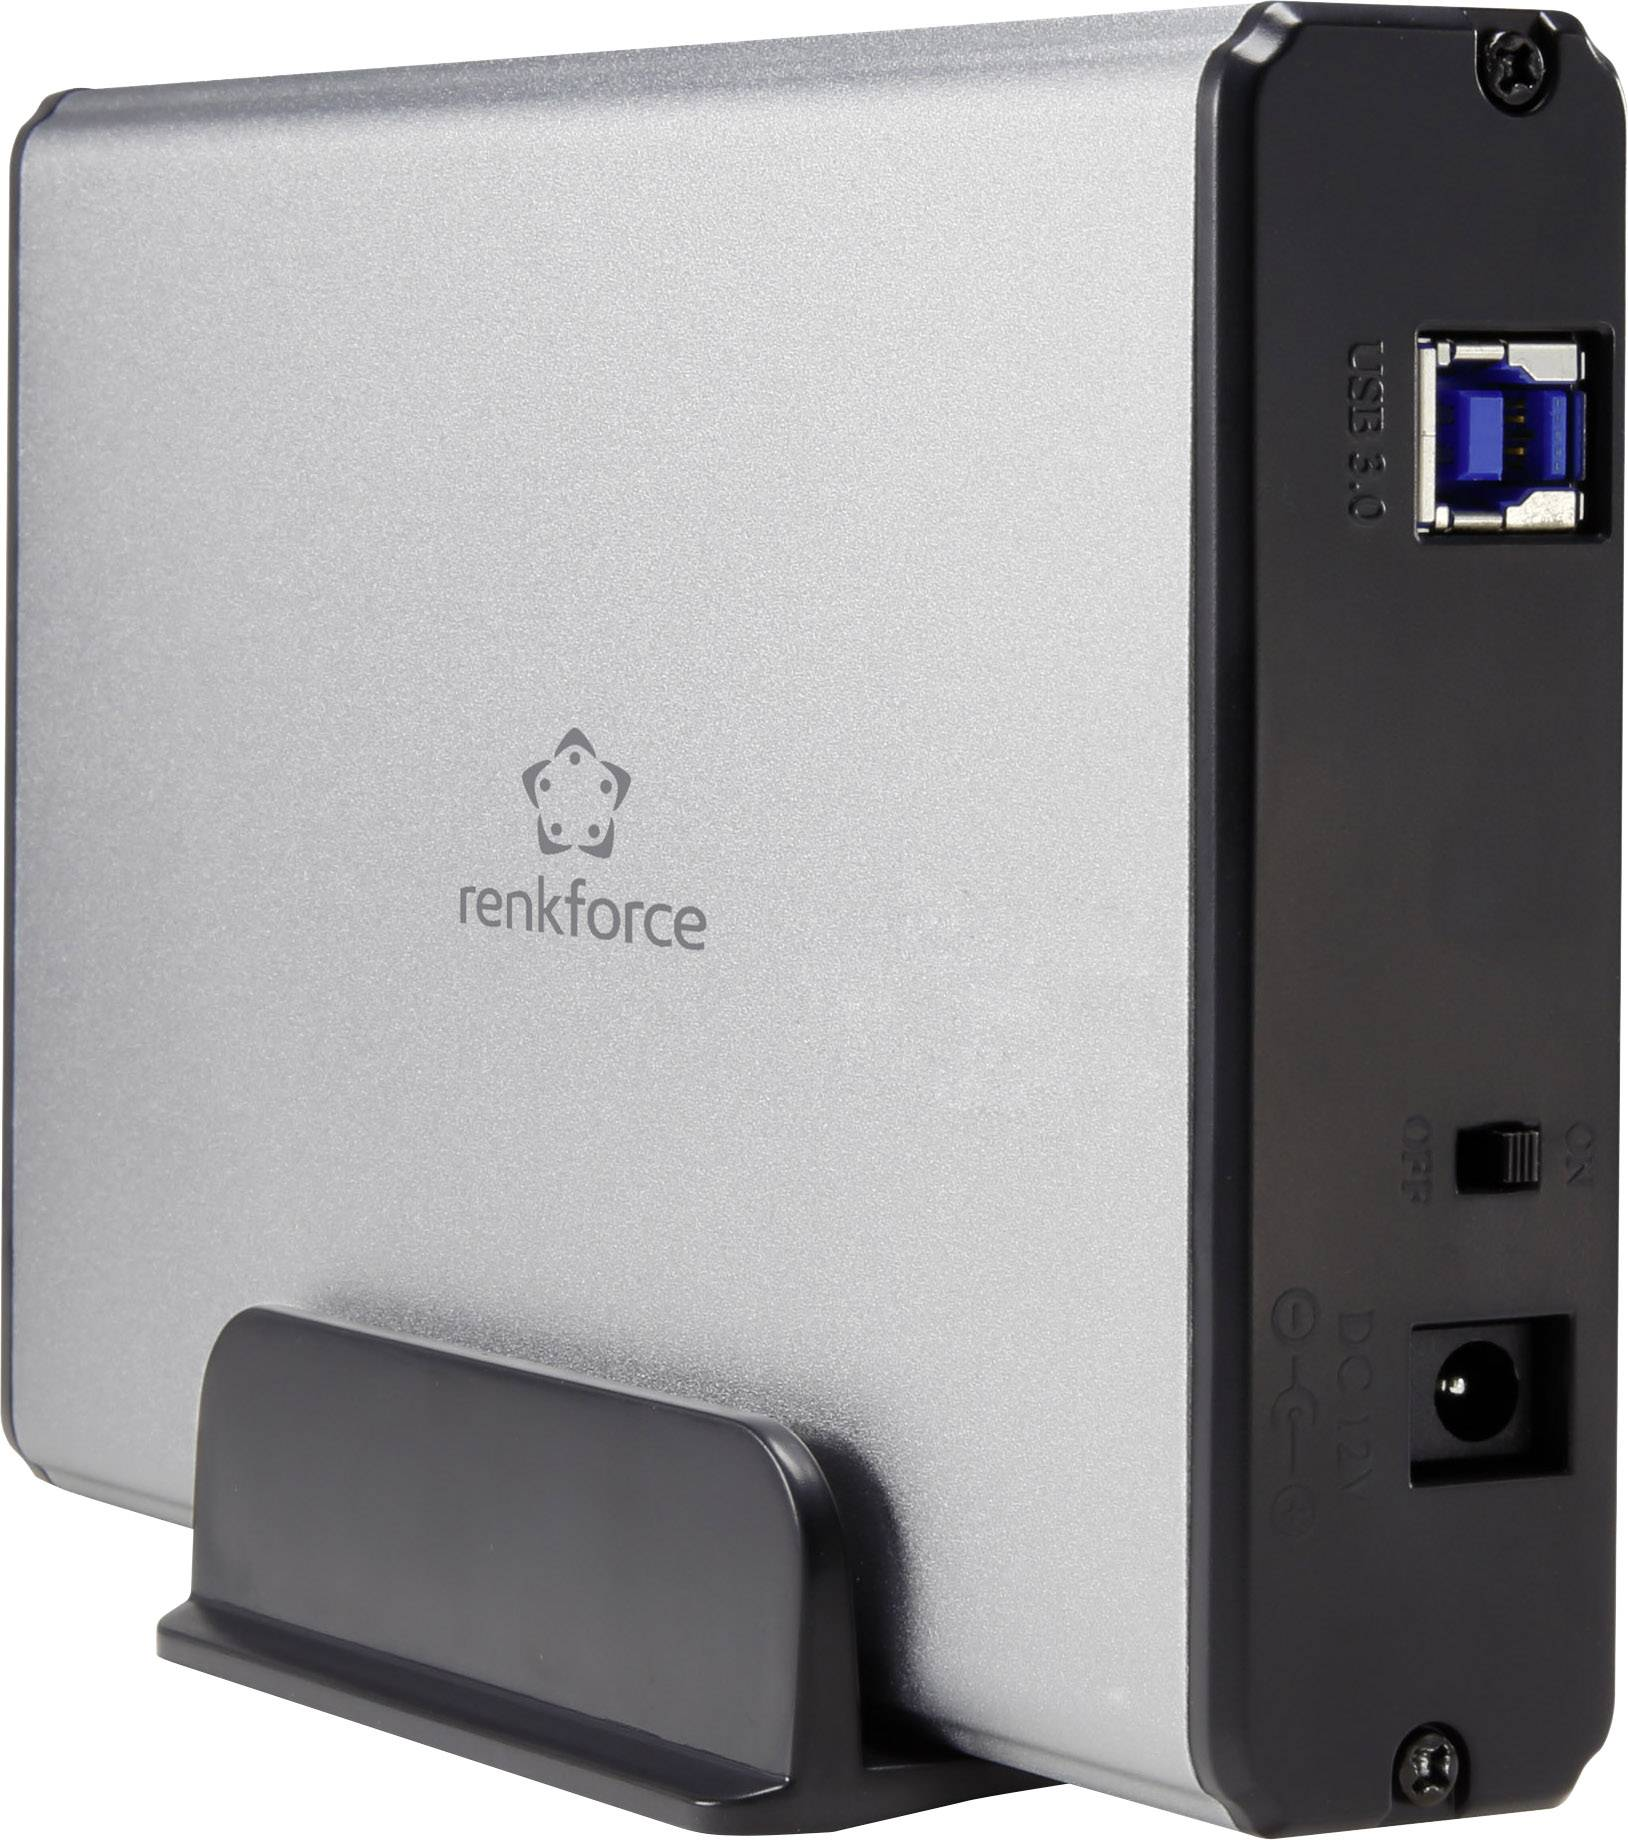 "Pouzdro pro disky SATA 3,5"" Renkforce HDA301J3P USB 3.0"